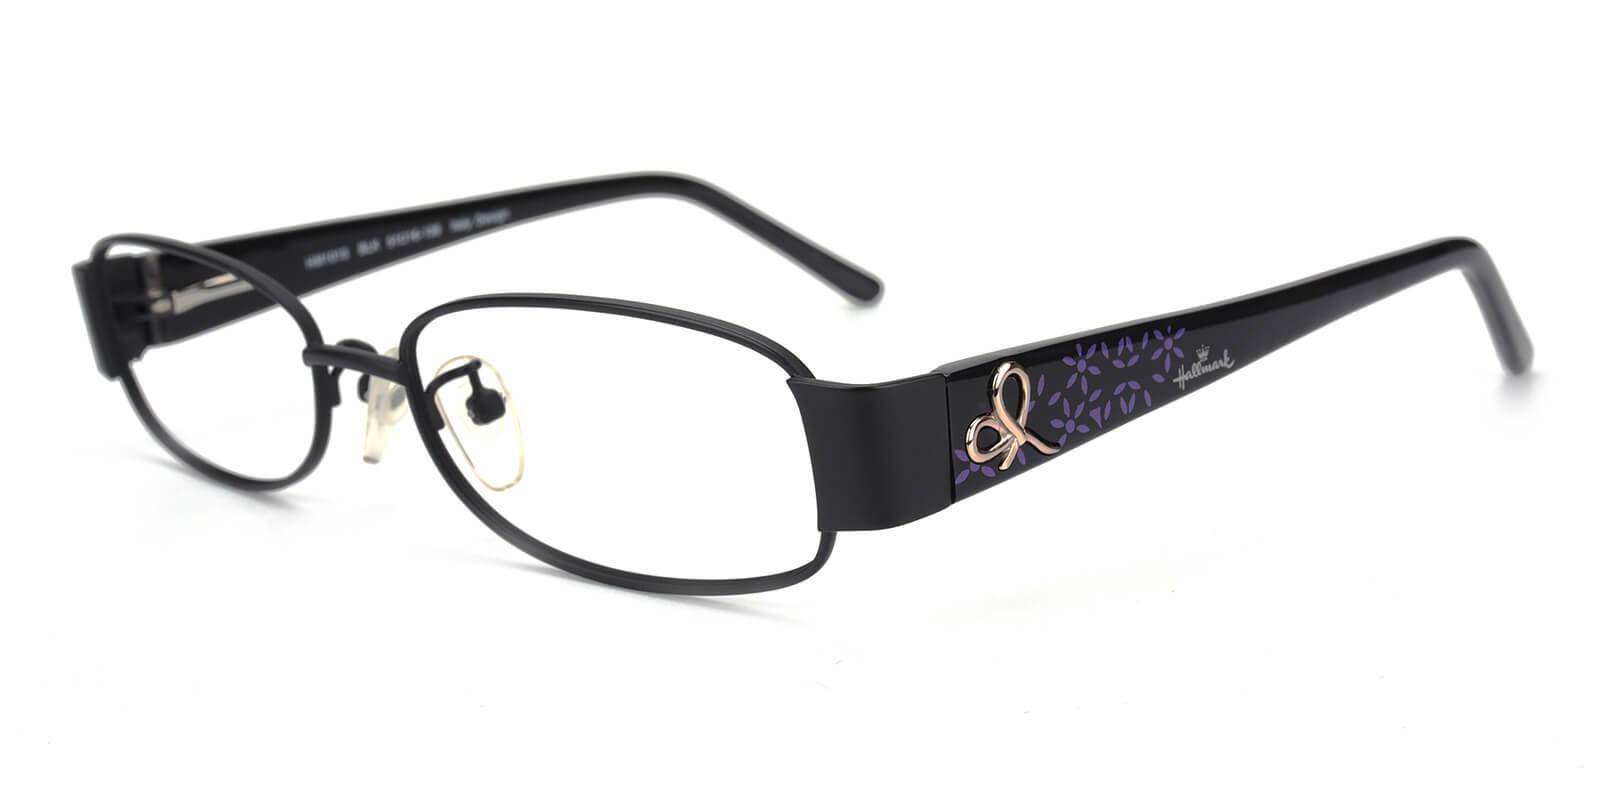 Janniey-Black-Rectangle-Metal-Eyeglasses-additional1